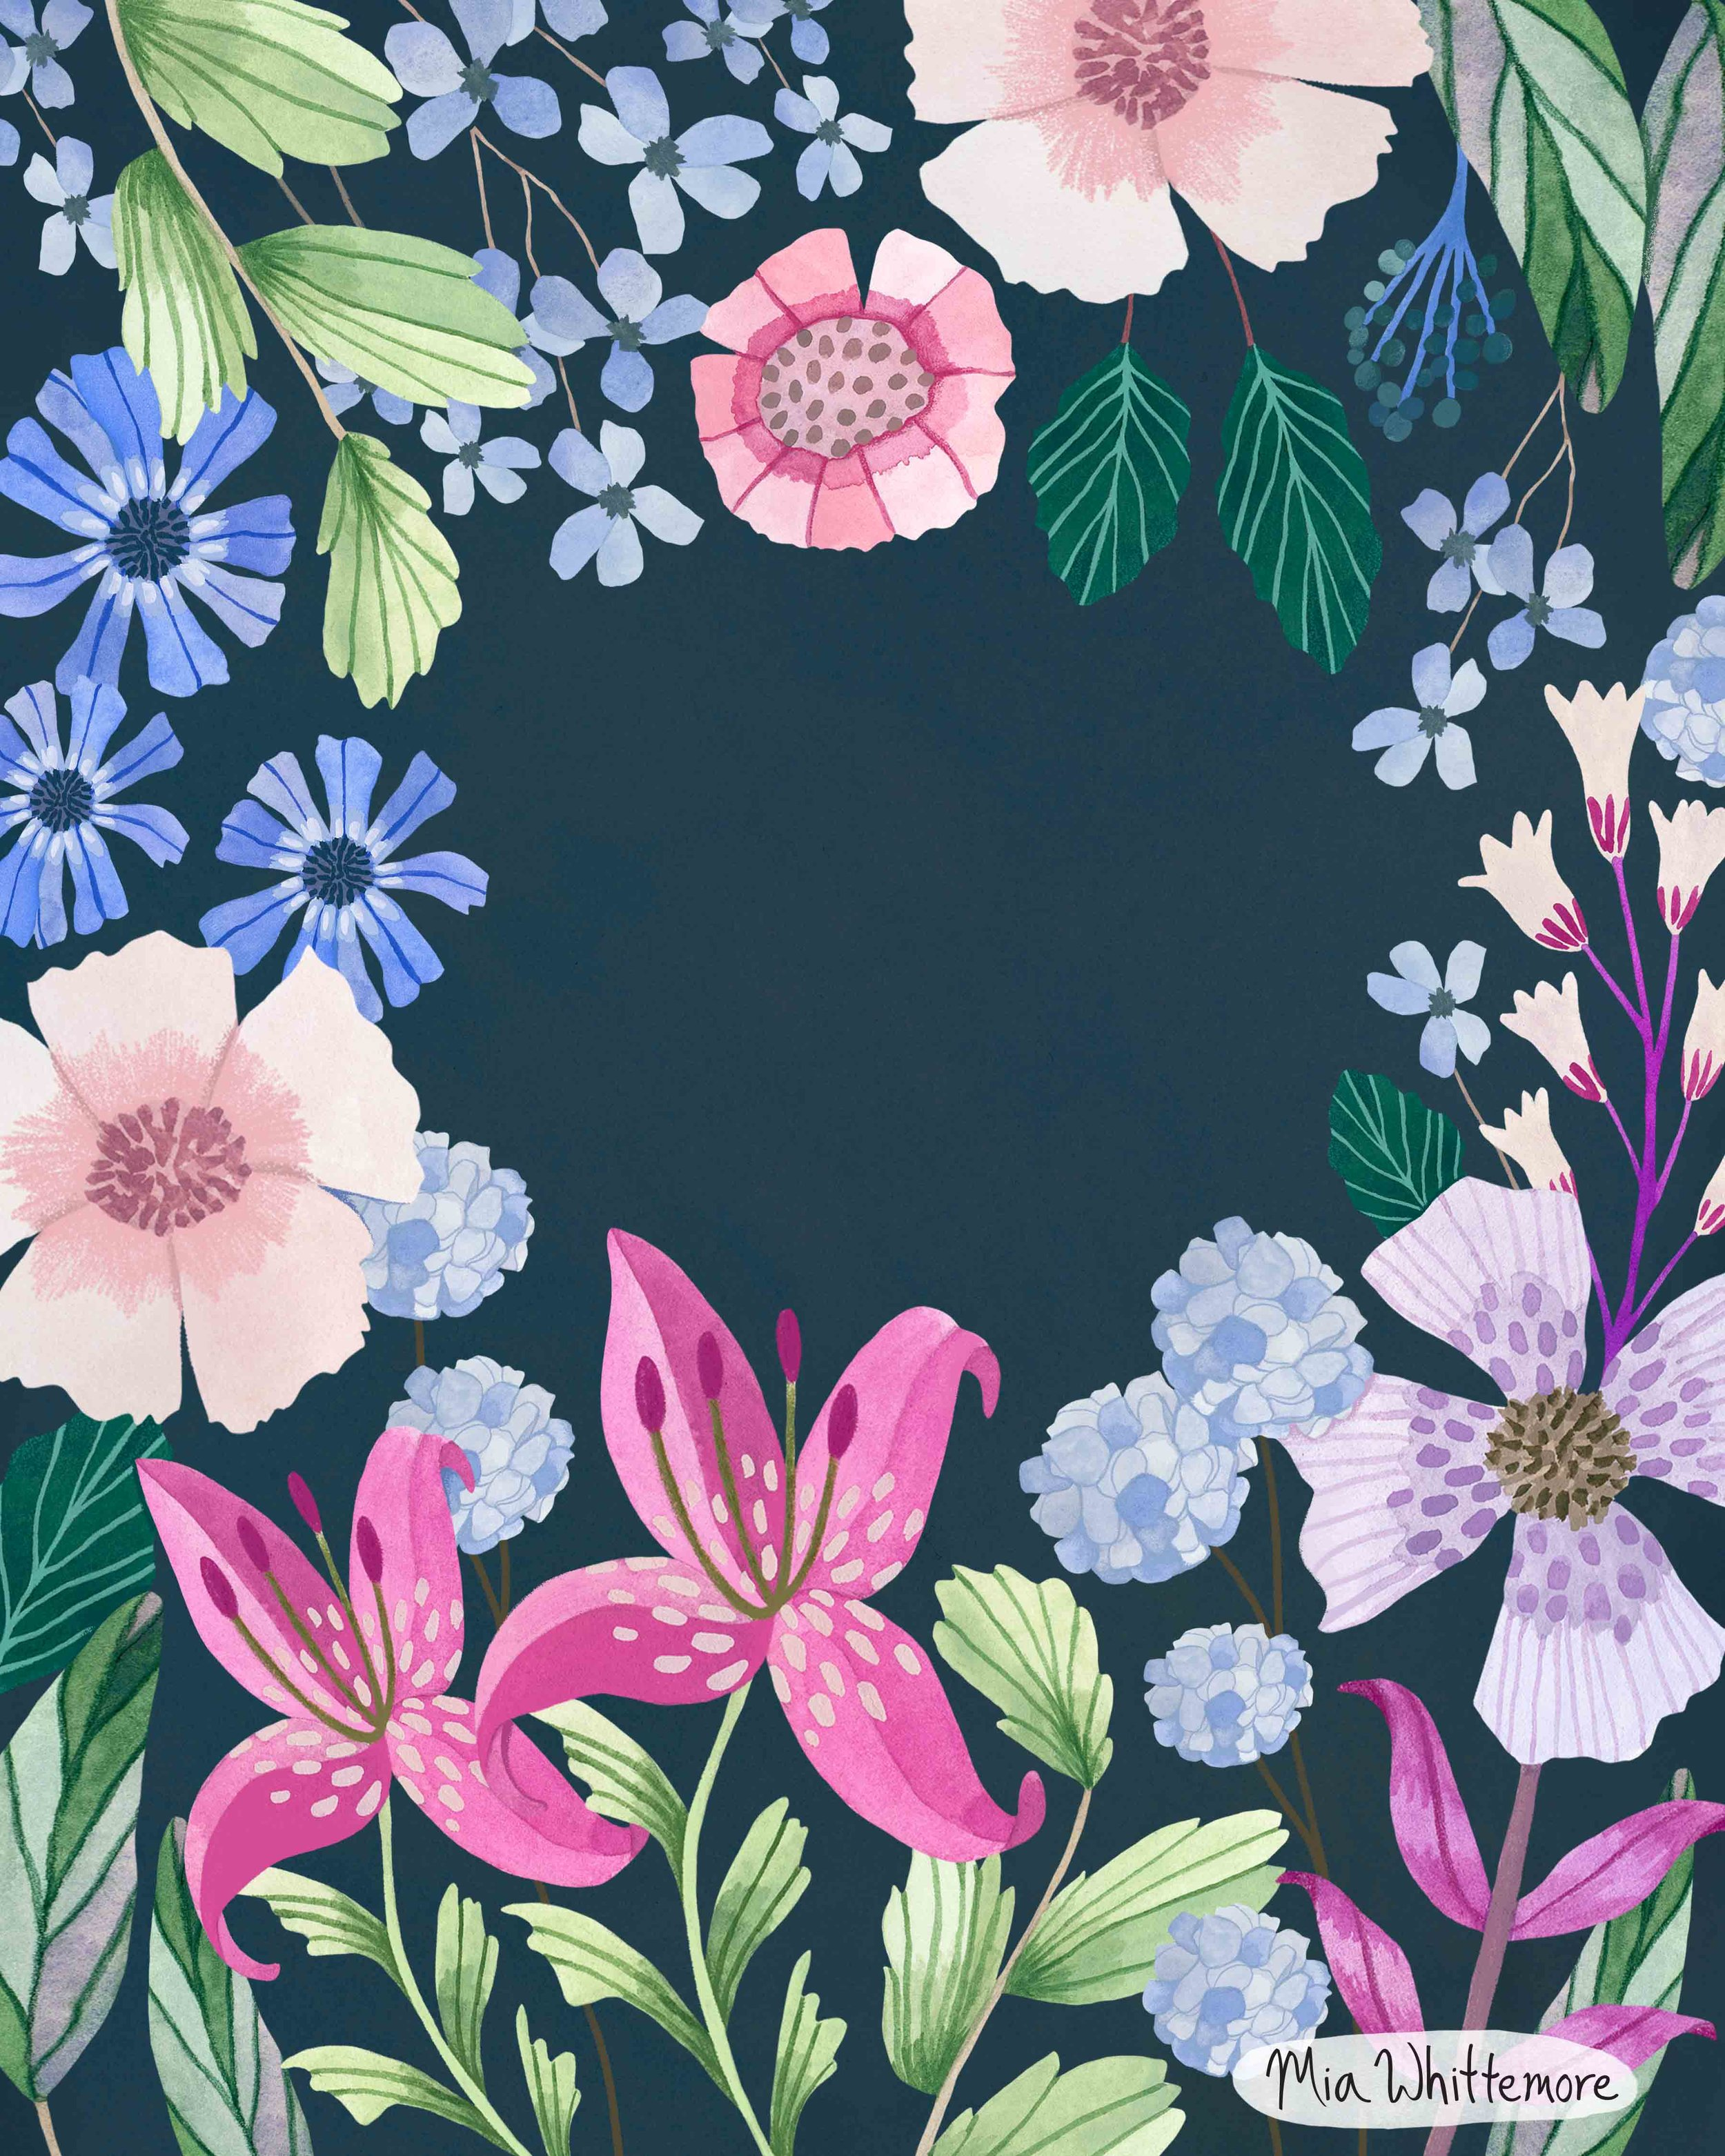 Mia Whittemore_Floral Border Blue.jpg